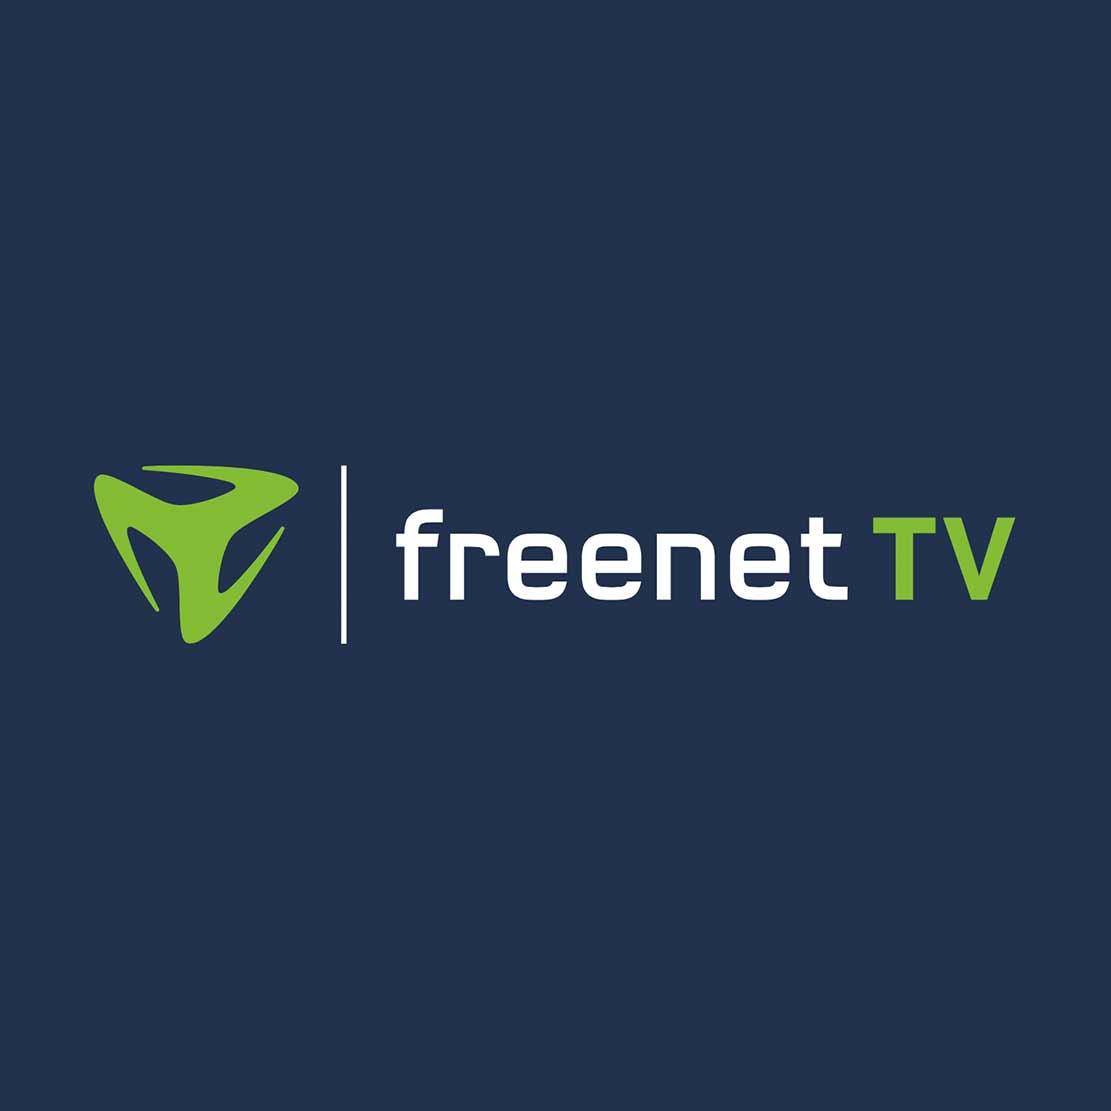 freenettv